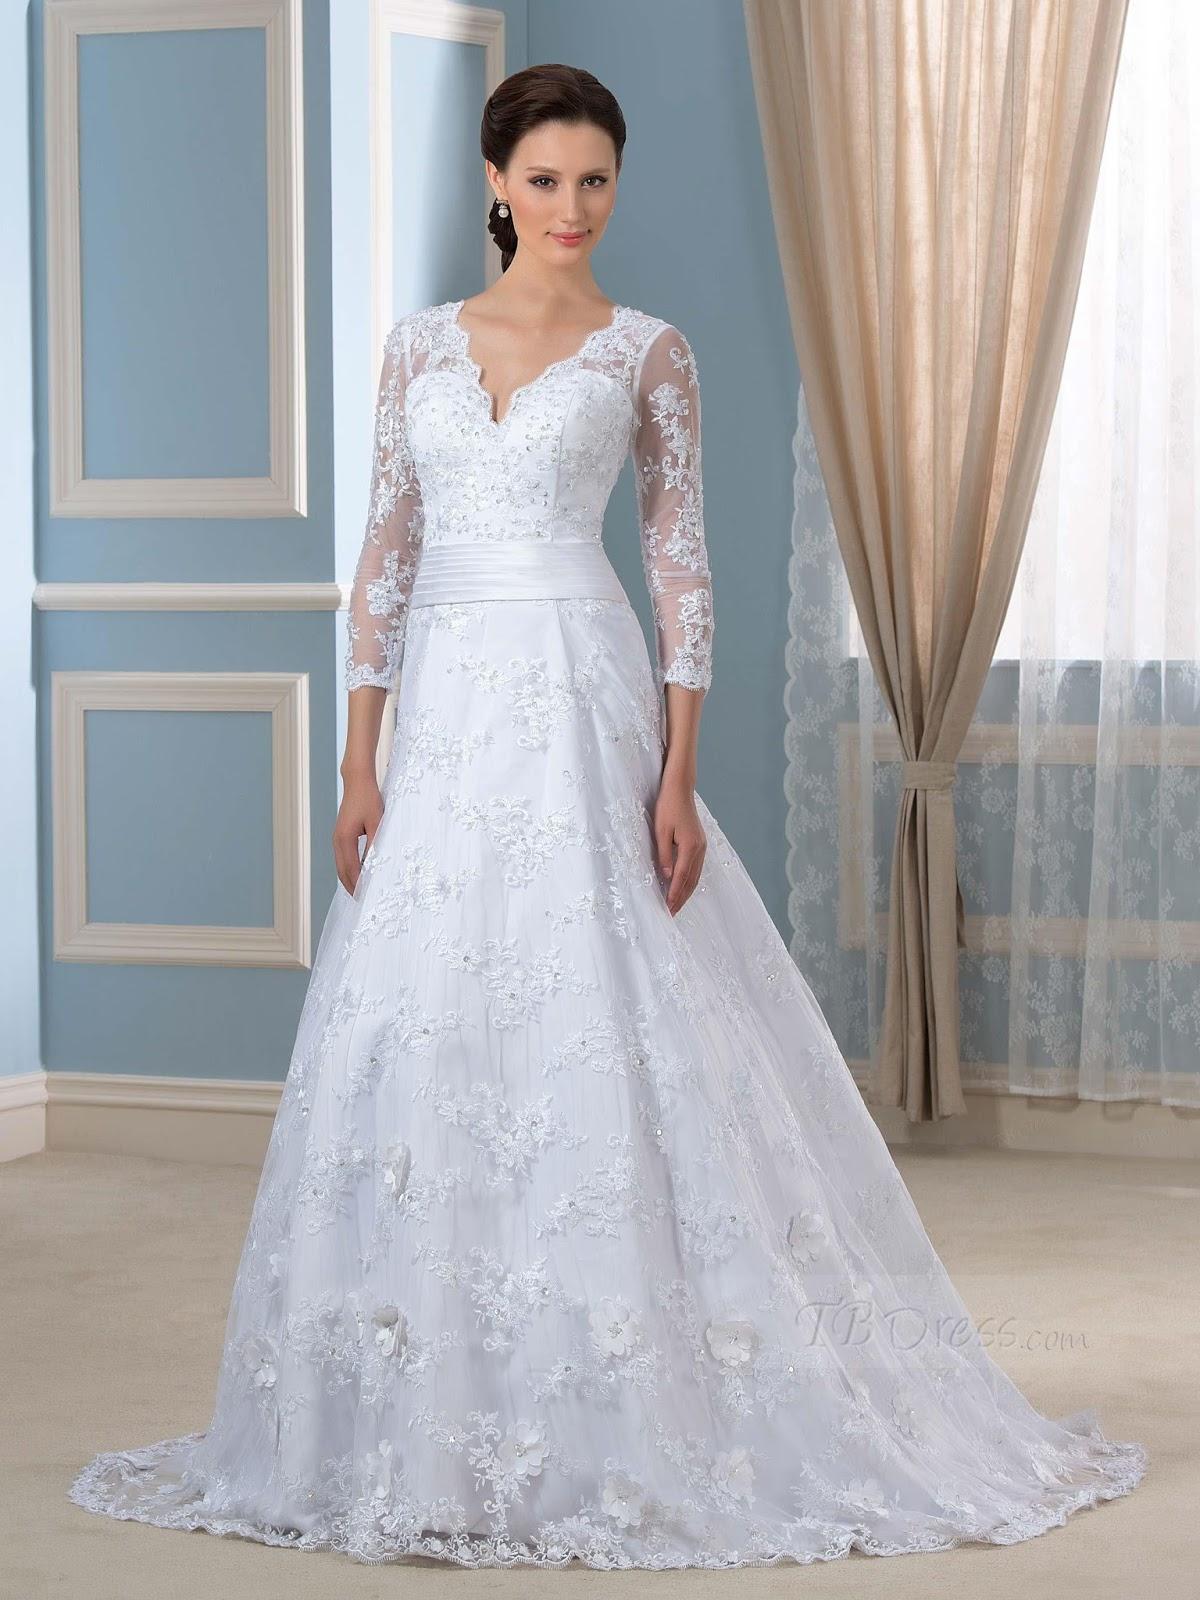 free wedding dresses photo - 1